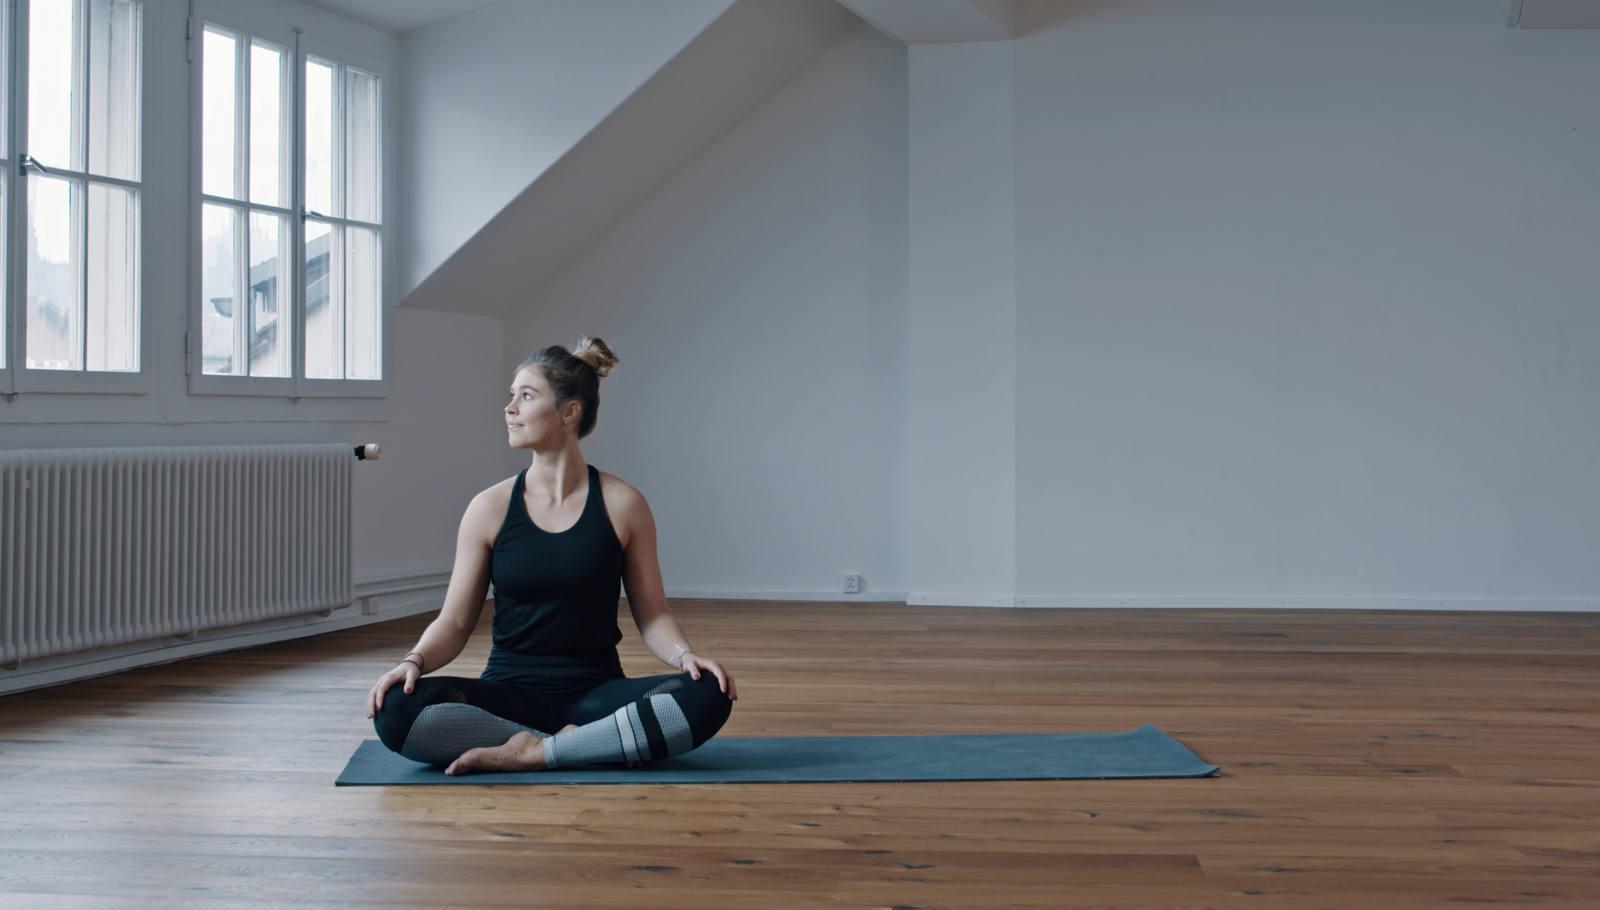 yoga-balance-frau-matte-schneidersitz.jpg